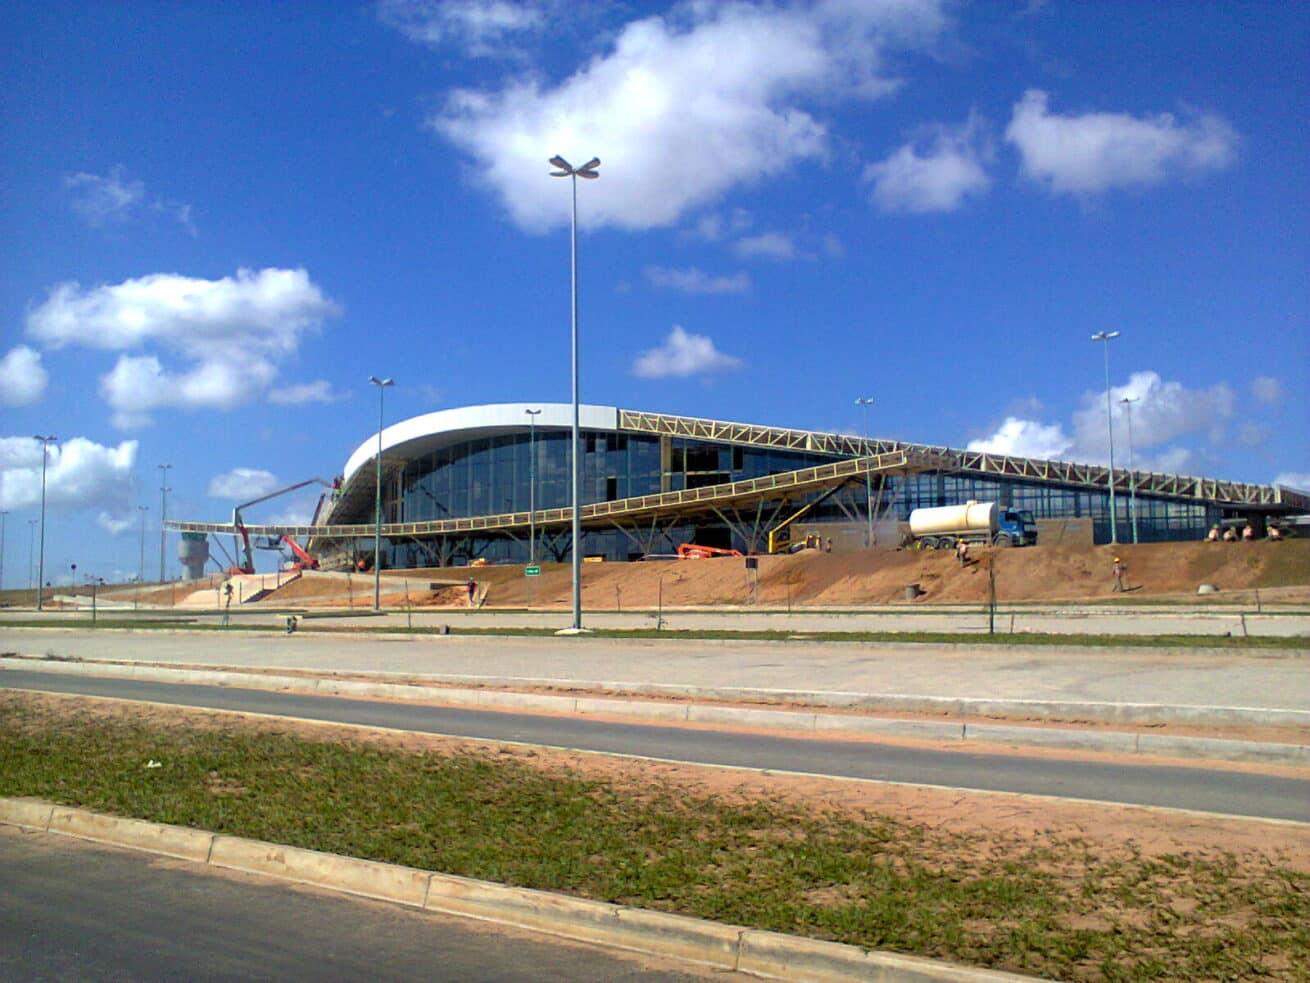 Aeroporto Internacional de Nacala